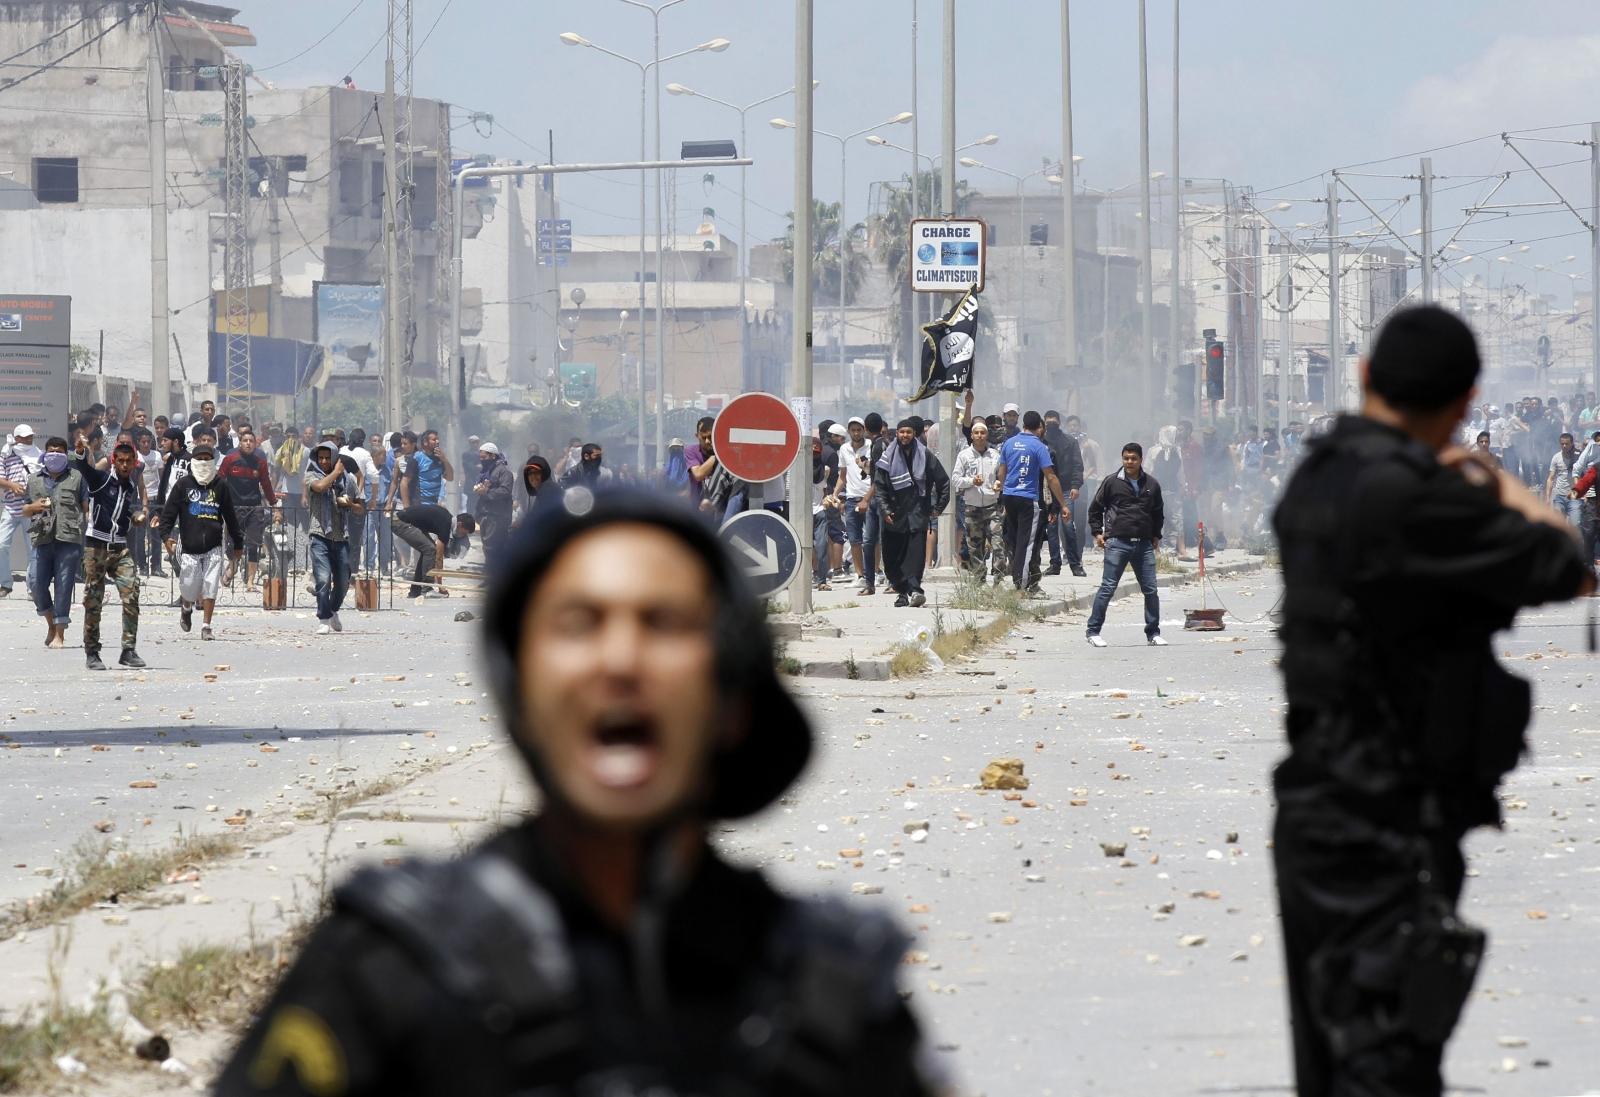 Tunisia Ansar al-Sharia fight